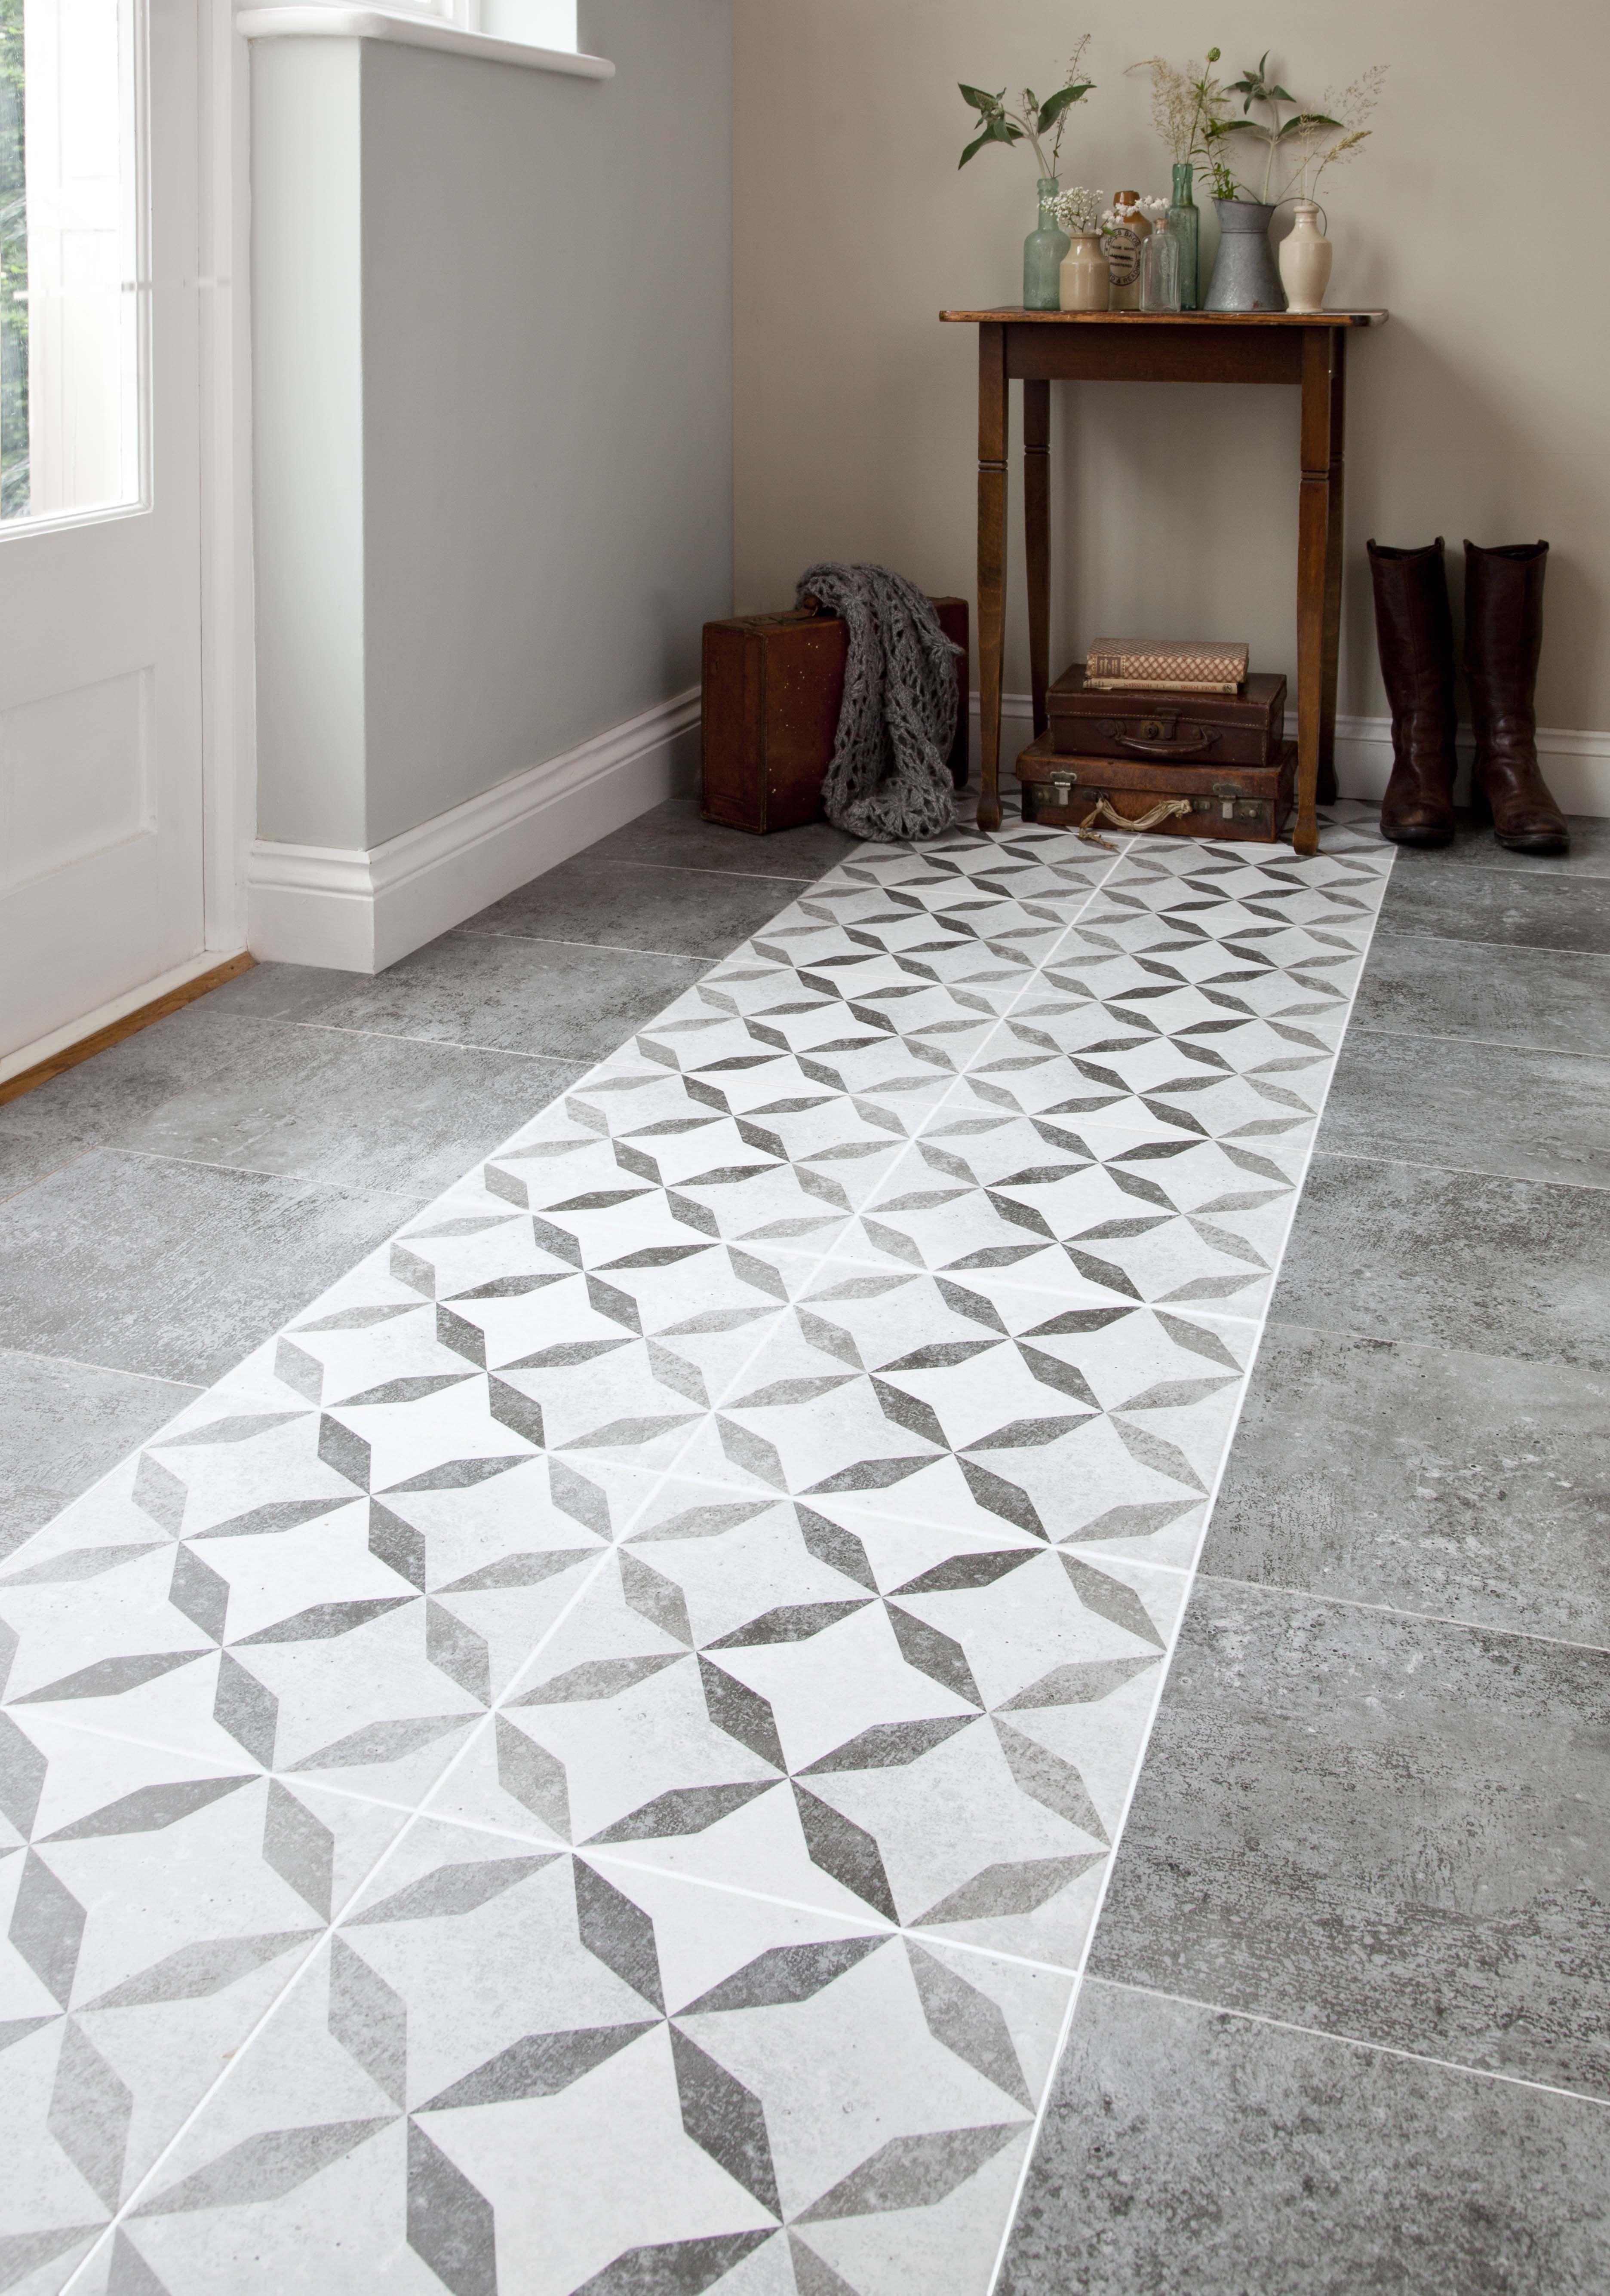 Feature Floors Concrete Tiles From House Of British Ceramic Tile Http Www Britishceramictile Co Patterned Floor Tiles Ceramic Floor Tiles Hallway Tiles Floor